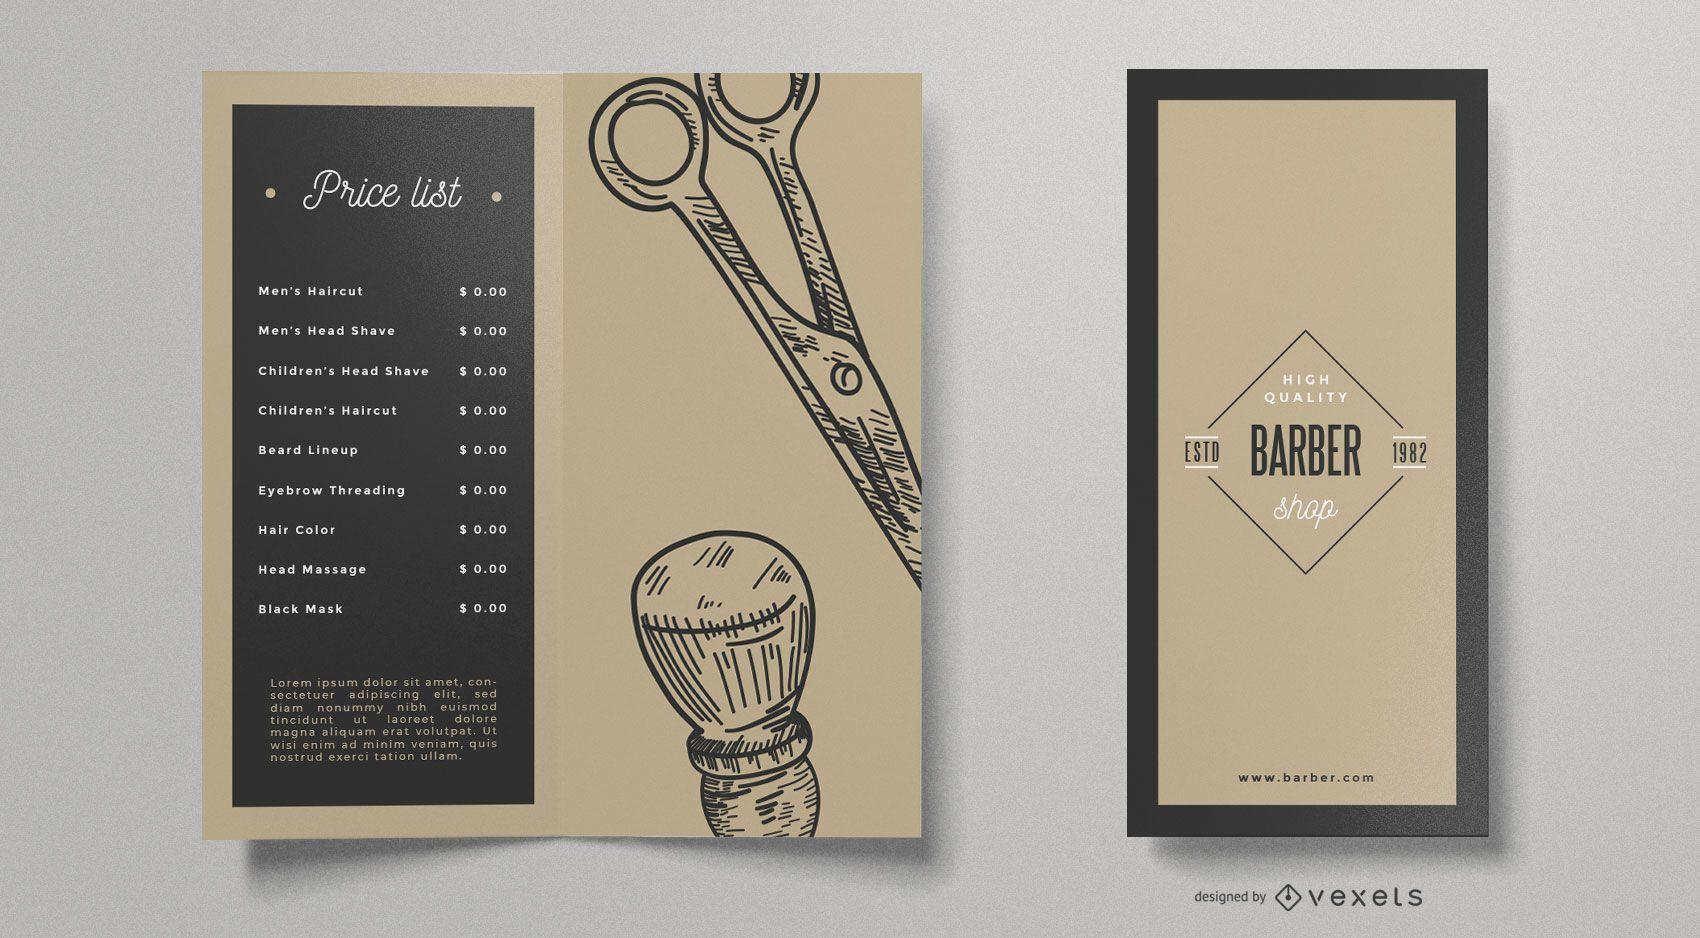 Vintage-Broschürenvorlage des Friseursalons